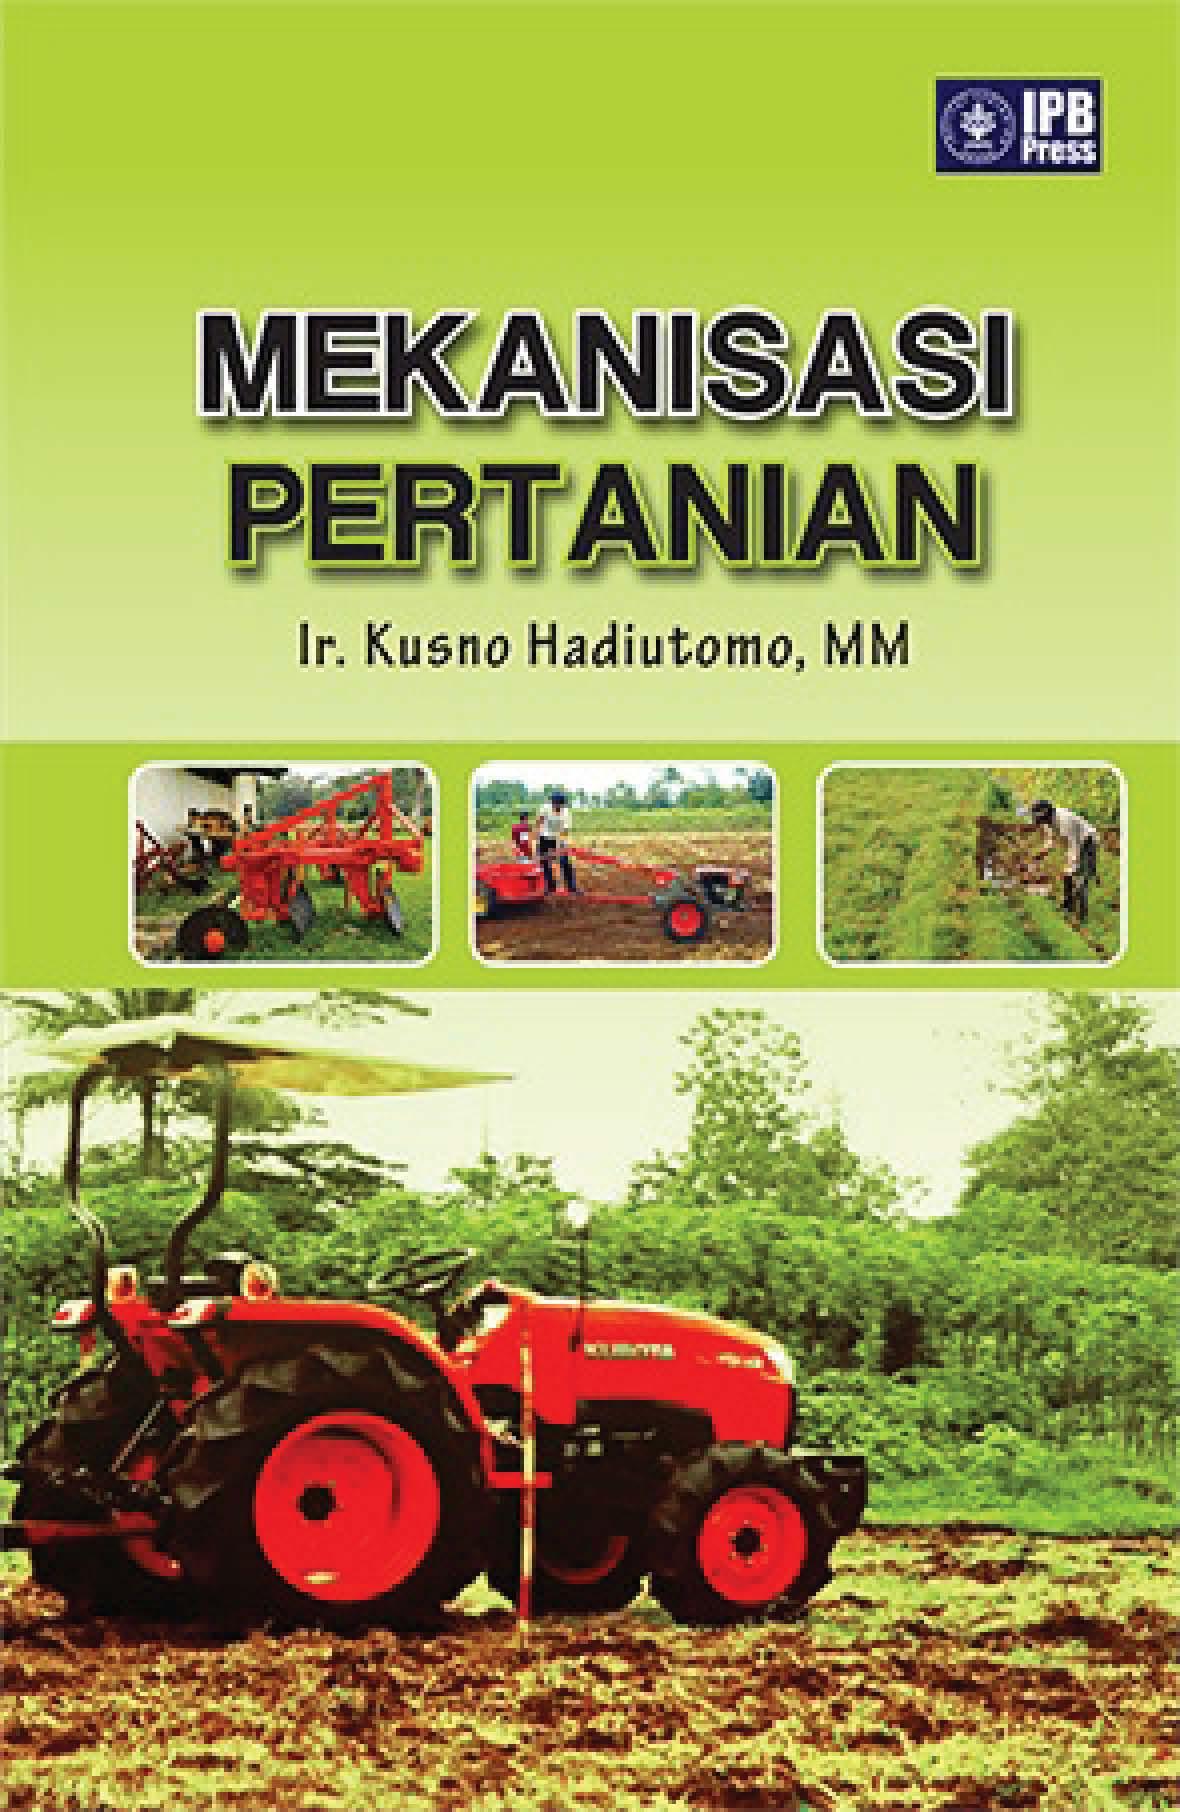 Mekanisasi pertanian [sumber elektronis]